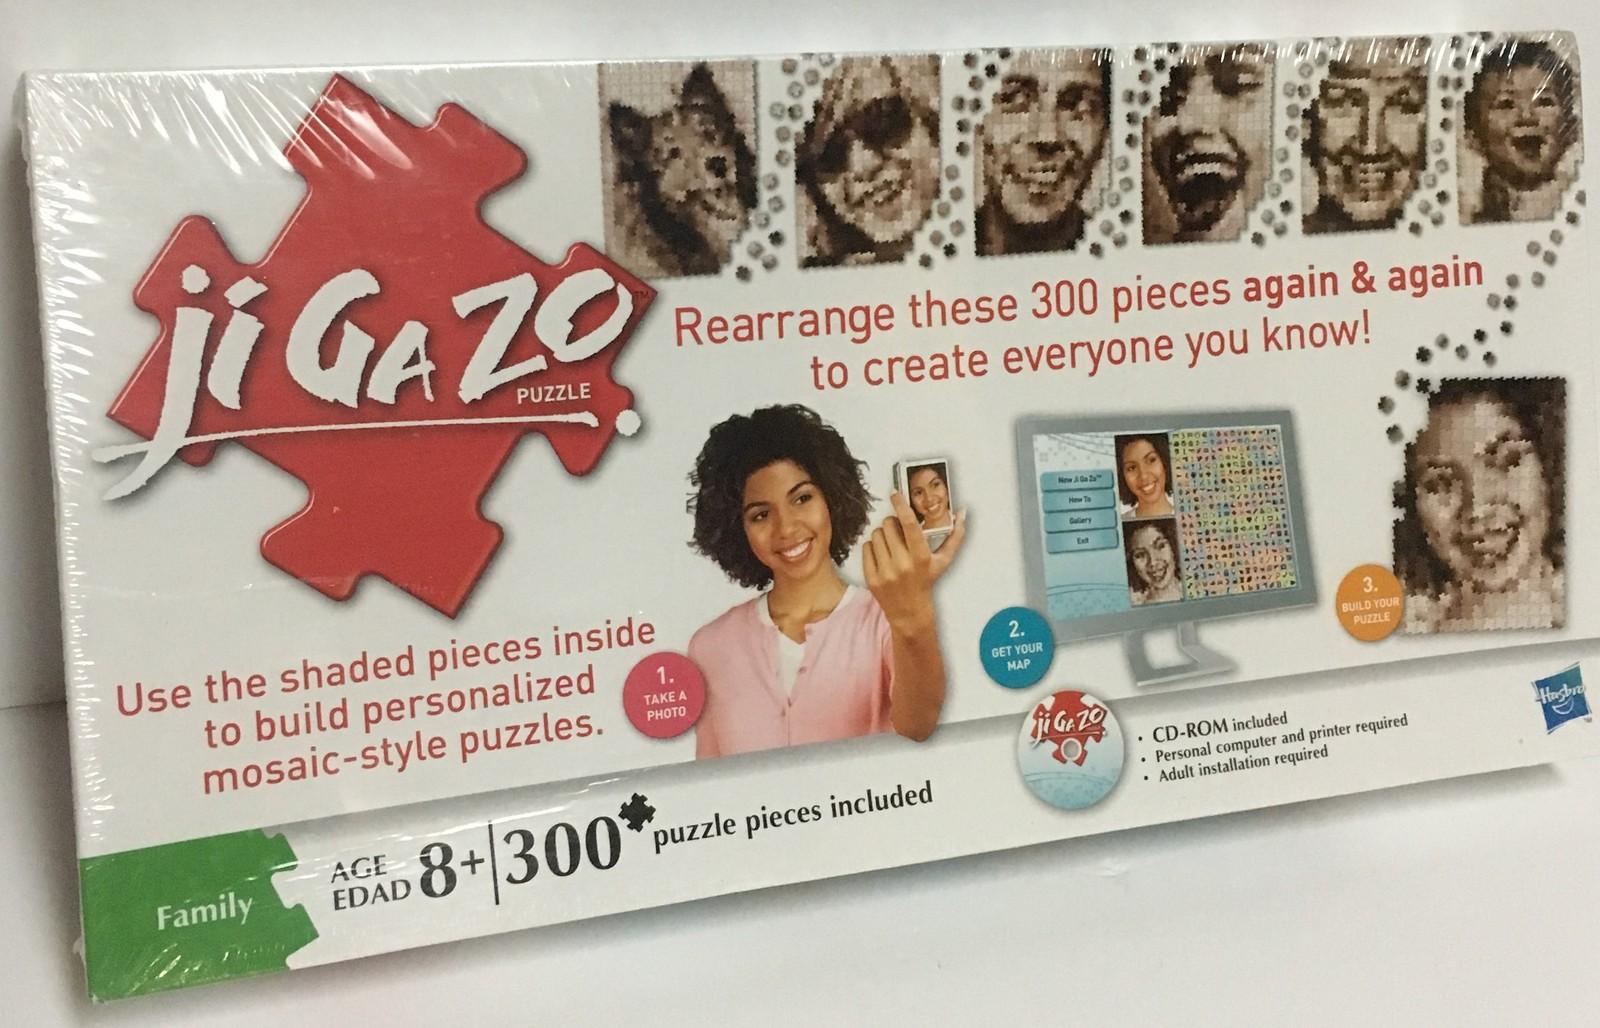 Hasbro JiGaZo Puzzle 300 Piece CD Included Age 8+ Create Mosaic Photos